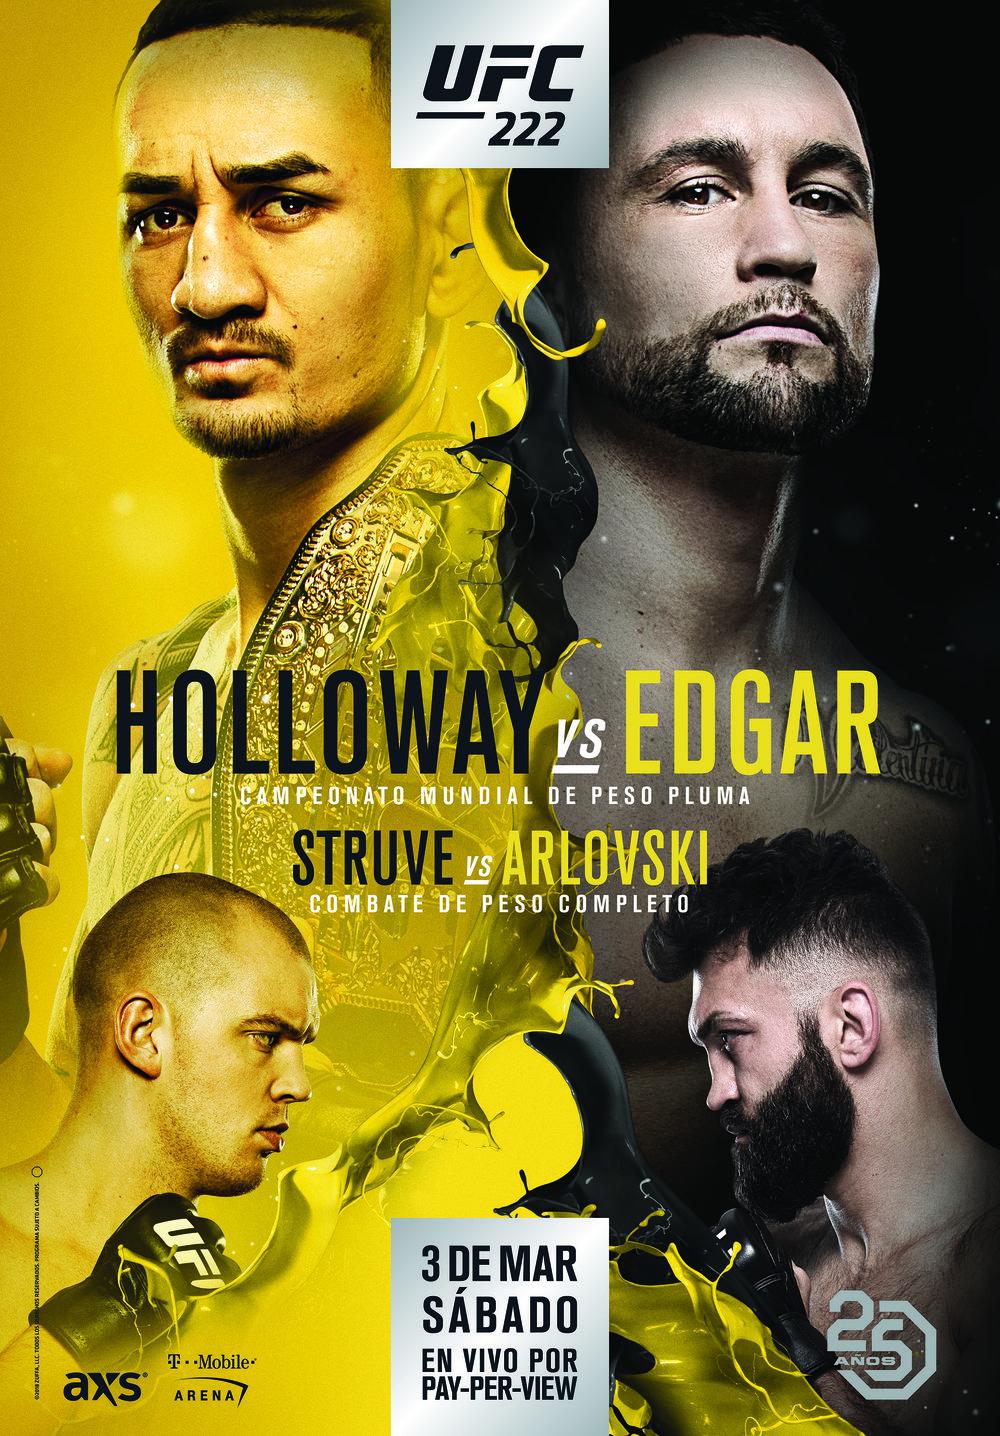 UFC_222_poster_spanish.jpg